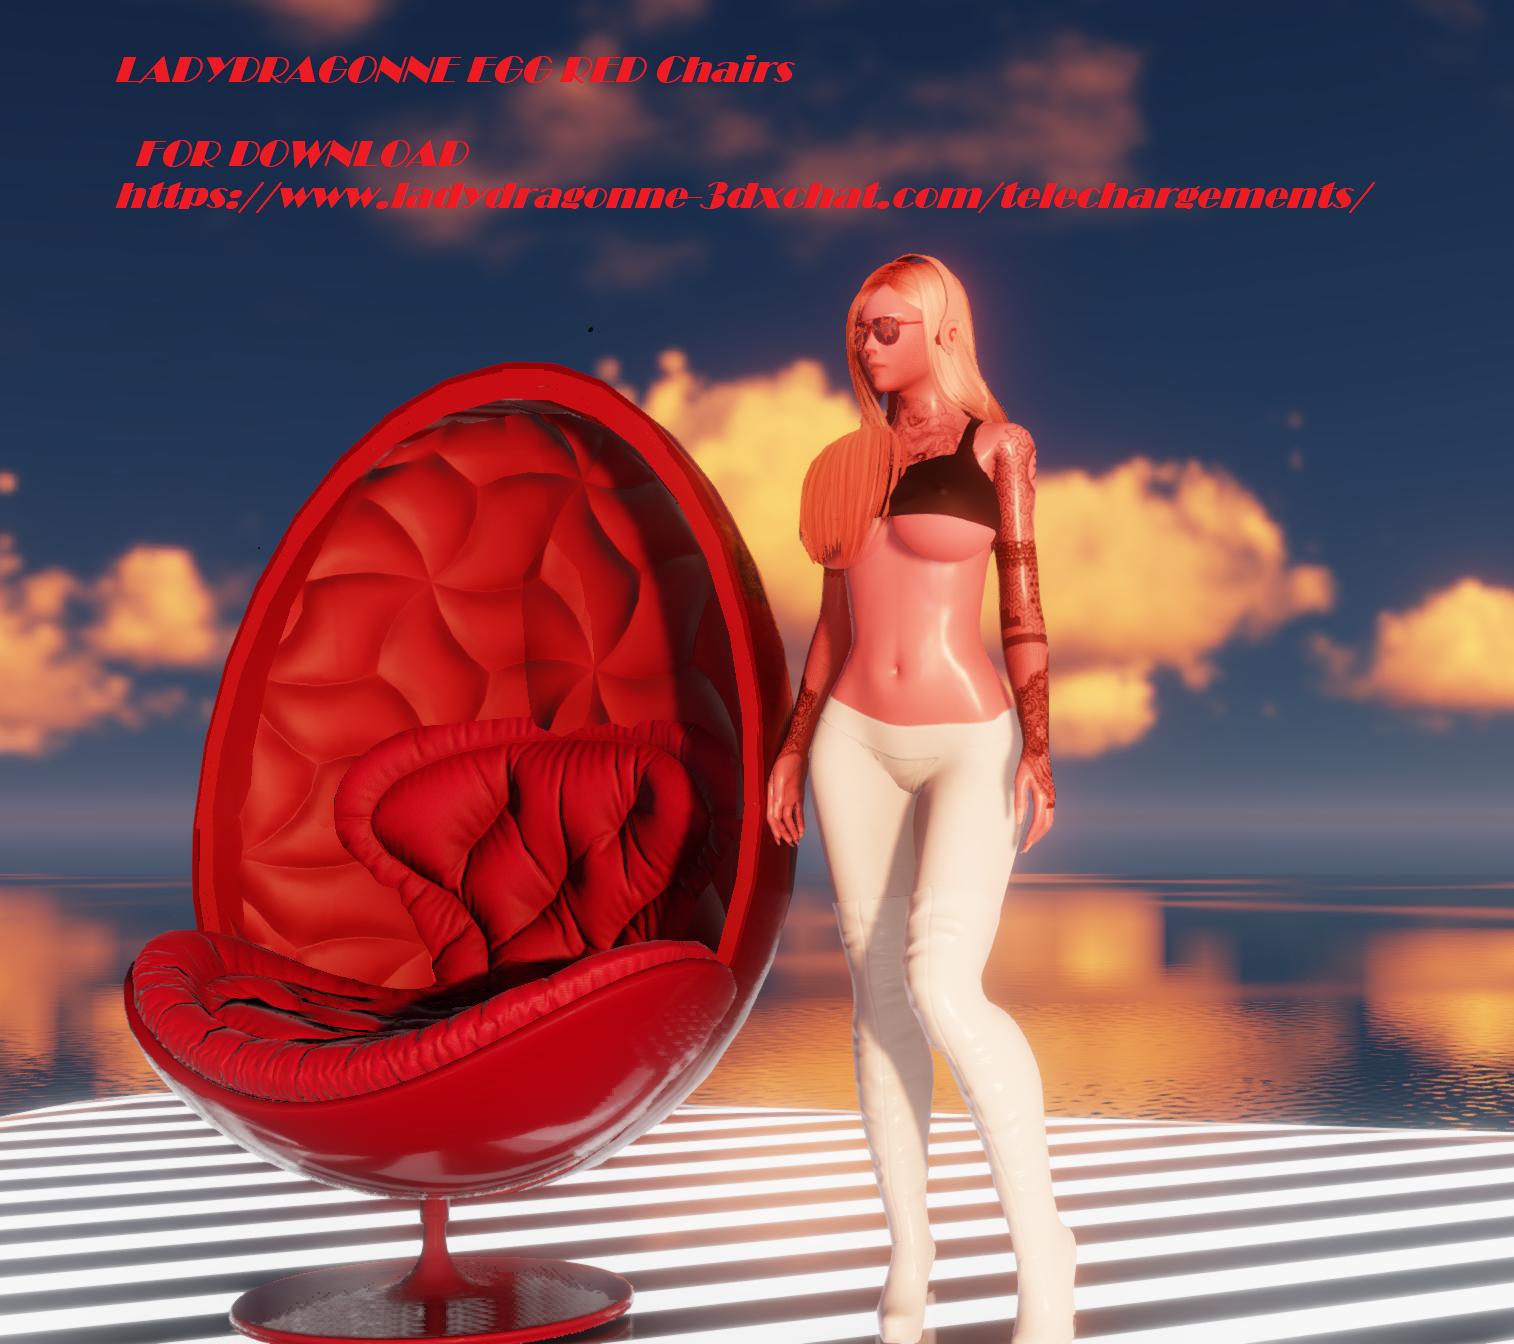 ladydragonne red egg chair